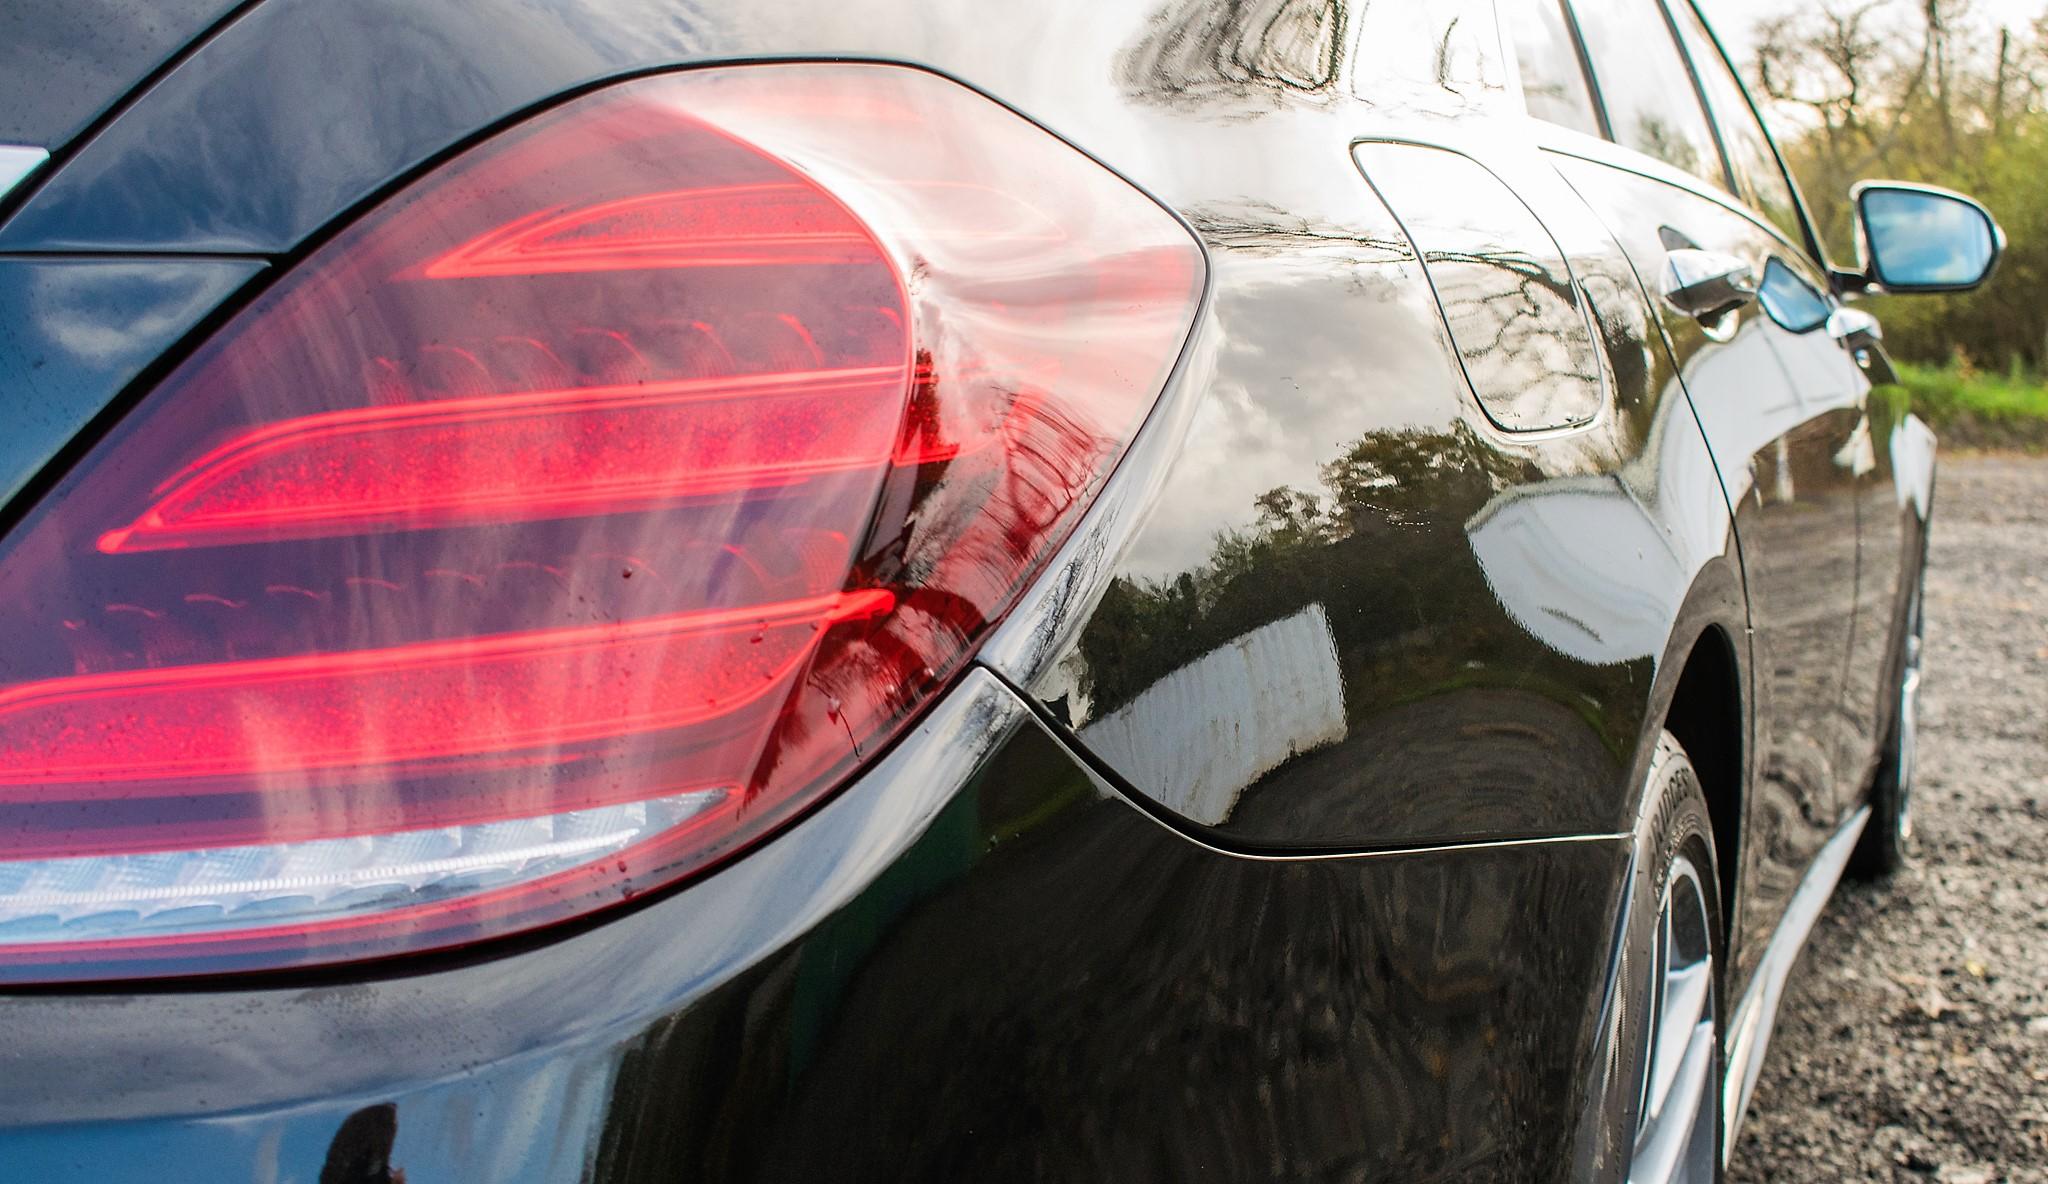 Mercedes Benz S450 L AMG Line Executive auto petrol 4 door saloon car Registration Number: FX68 - Image 13 of 33